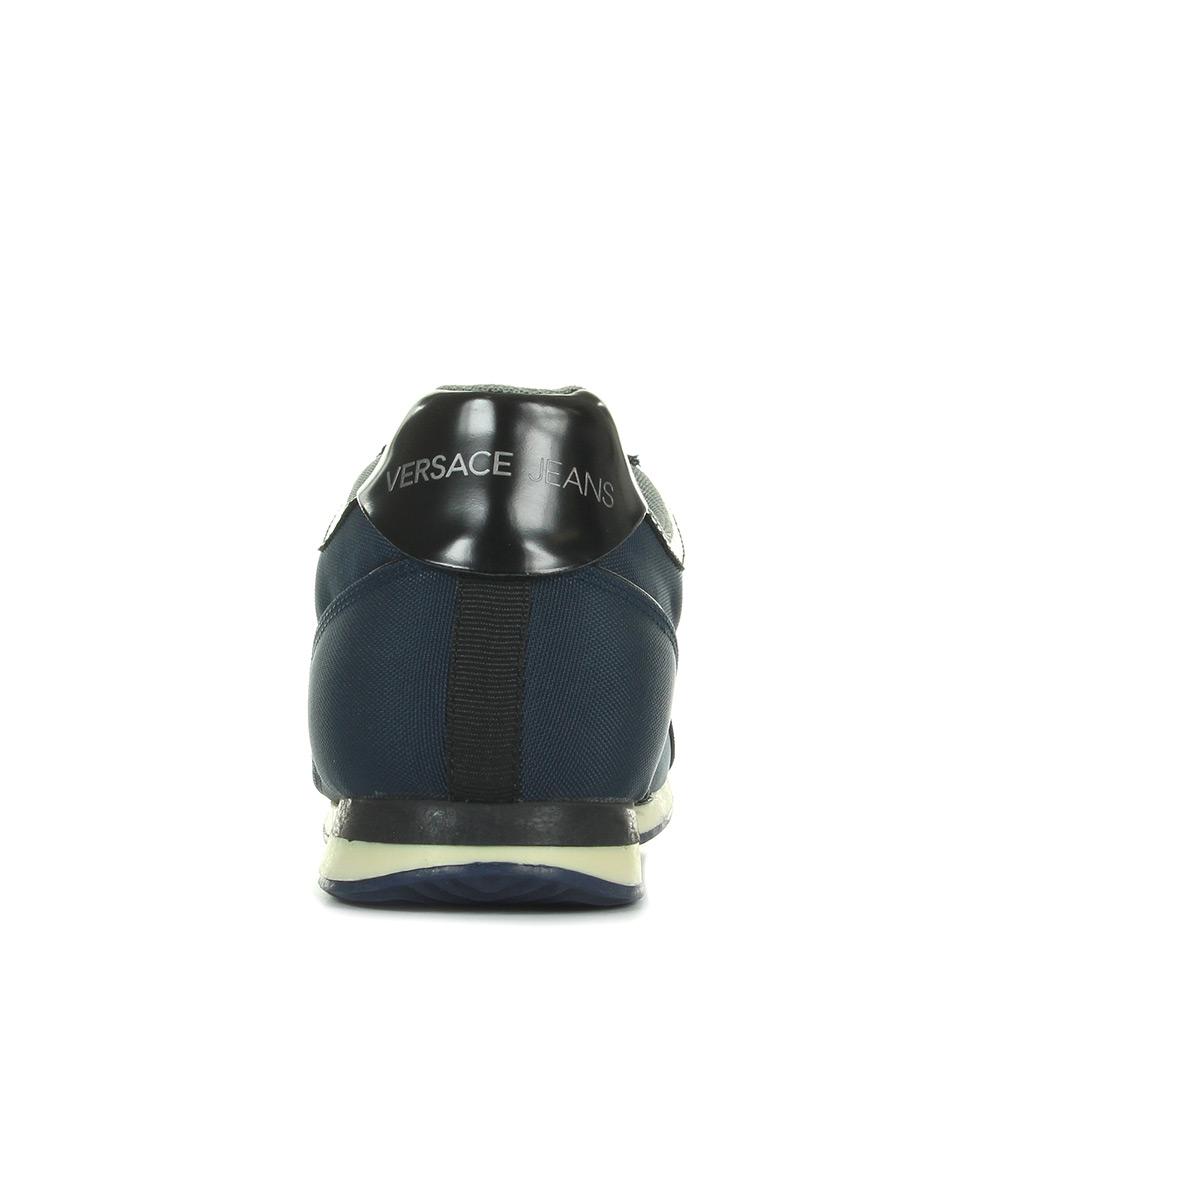 ... chaussures   Basses Versace Jeans Sneaker Uomo DisA2 Nylon E0YPBSA2239,  Baskets mode homme ... 58c66fde489